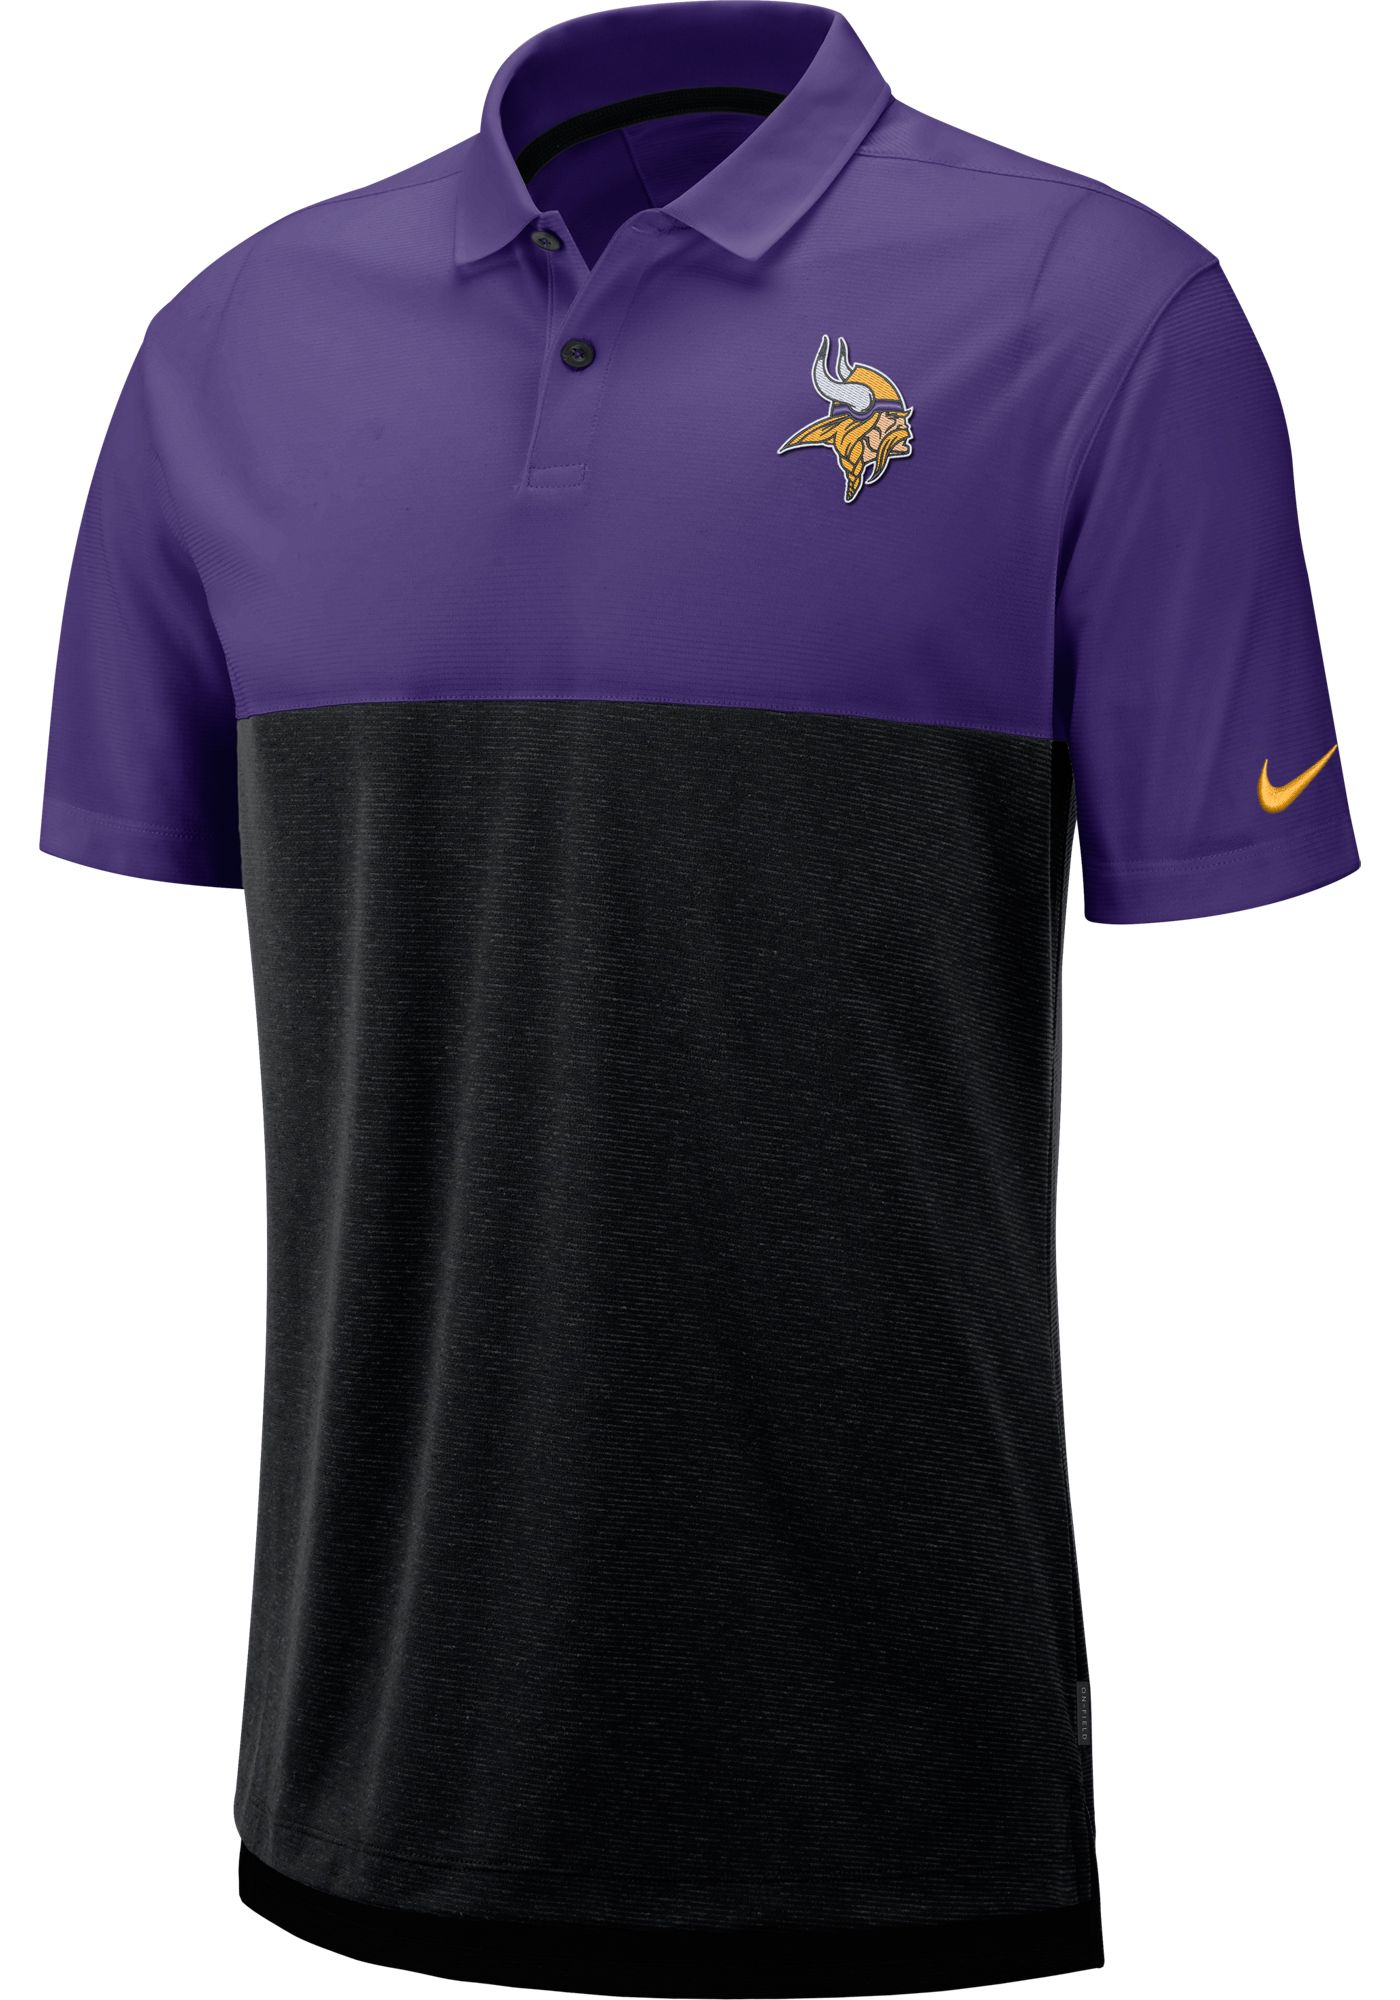 Nike Men's Minnesota Vikings Sideline Early Season Purple Polo